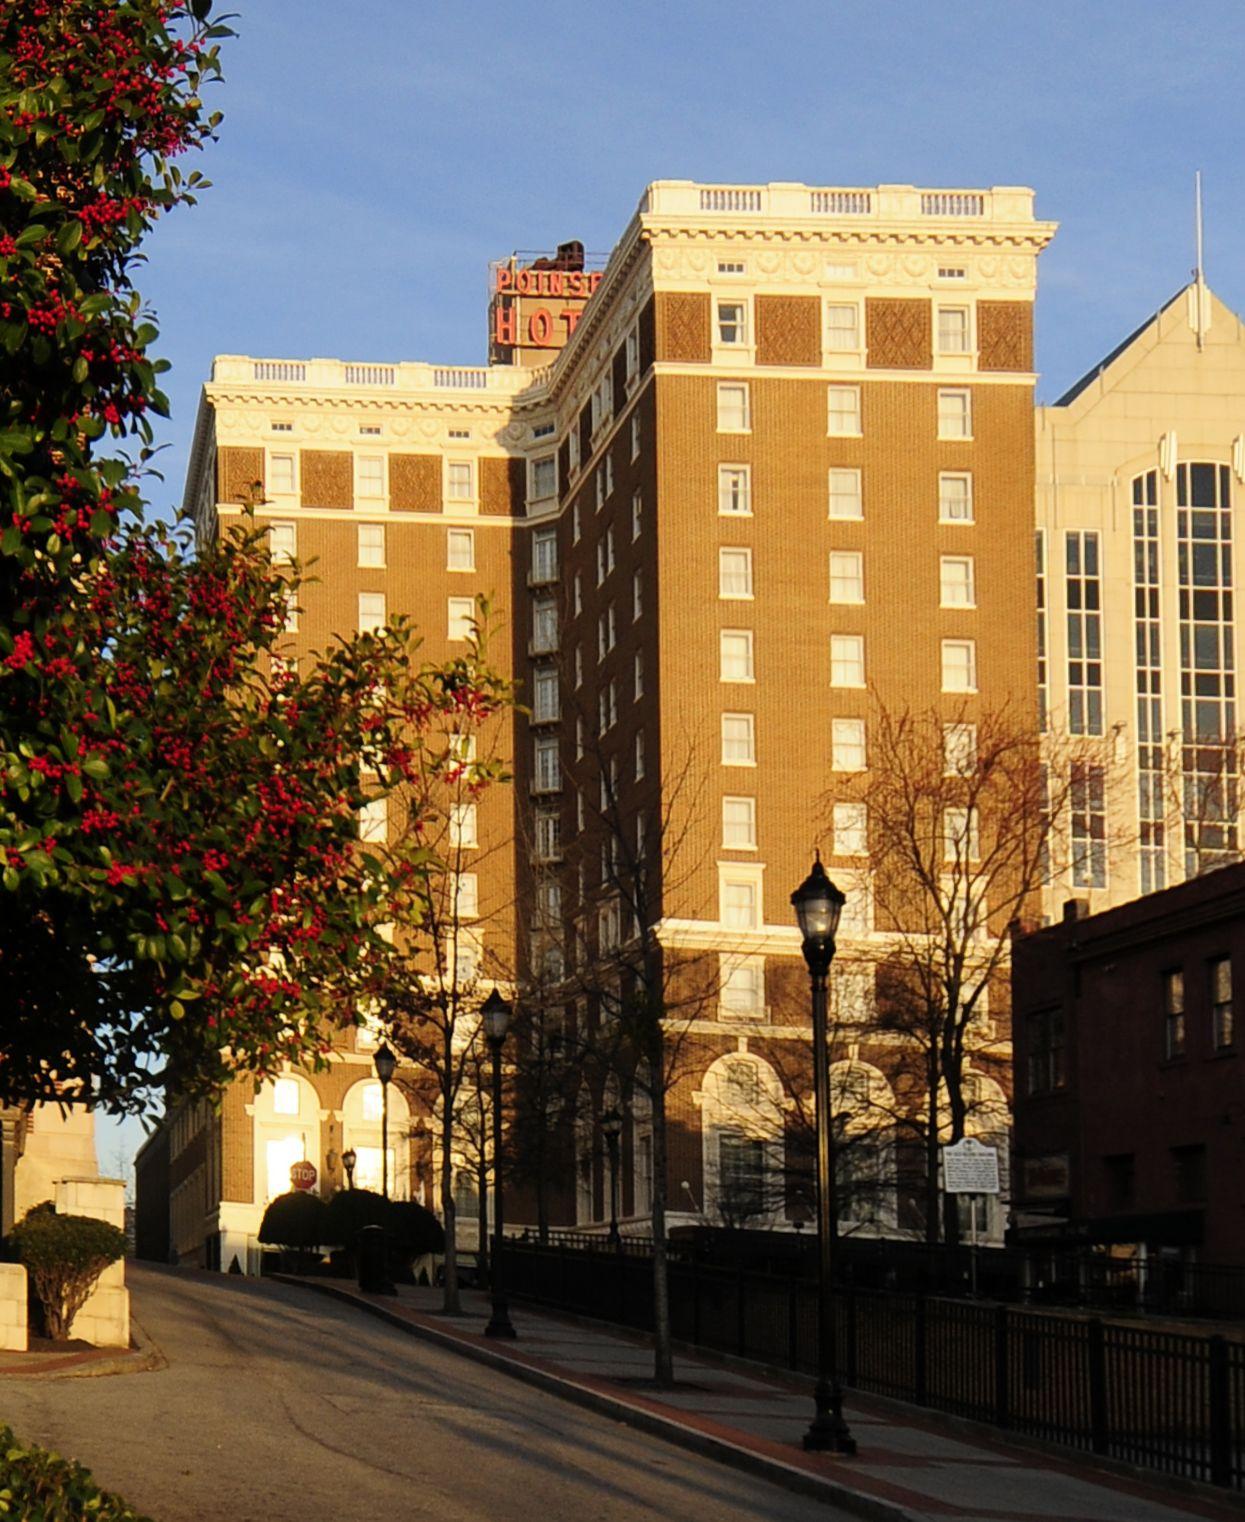 Poinsett Hotel Greenville Sc Google Search Filtered Charleston Hotels City Hotel Hotel